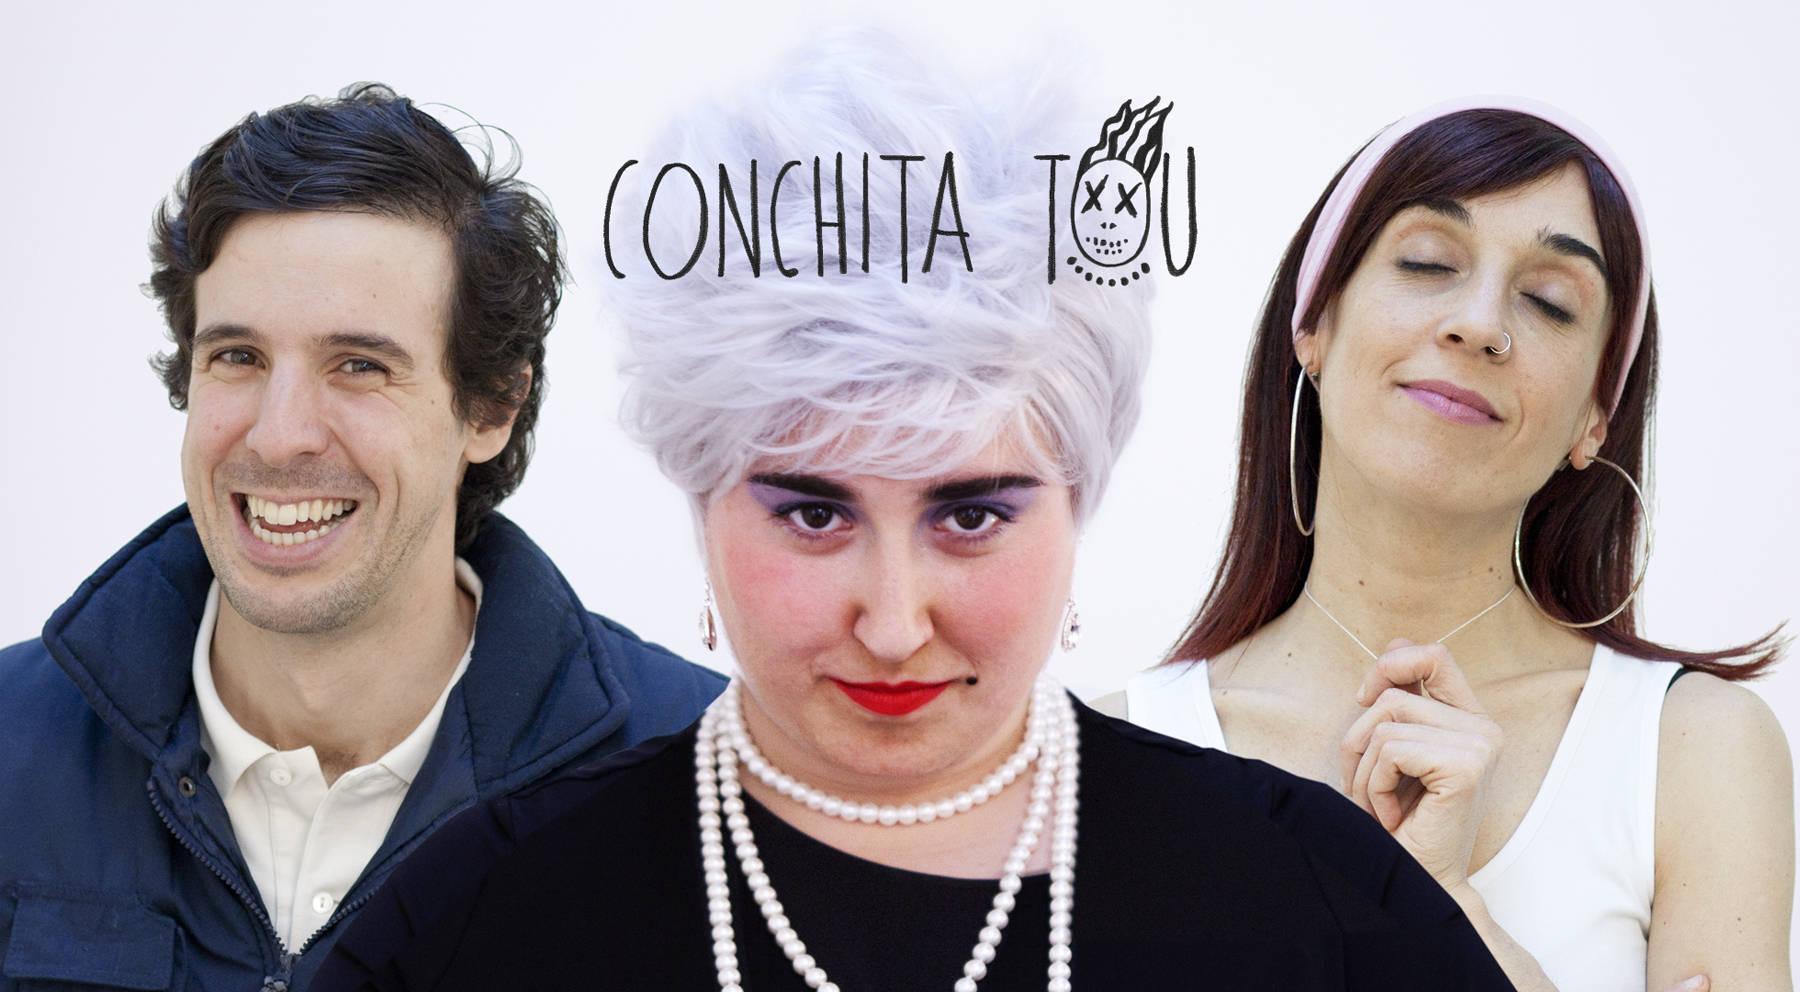 Conchita Tou